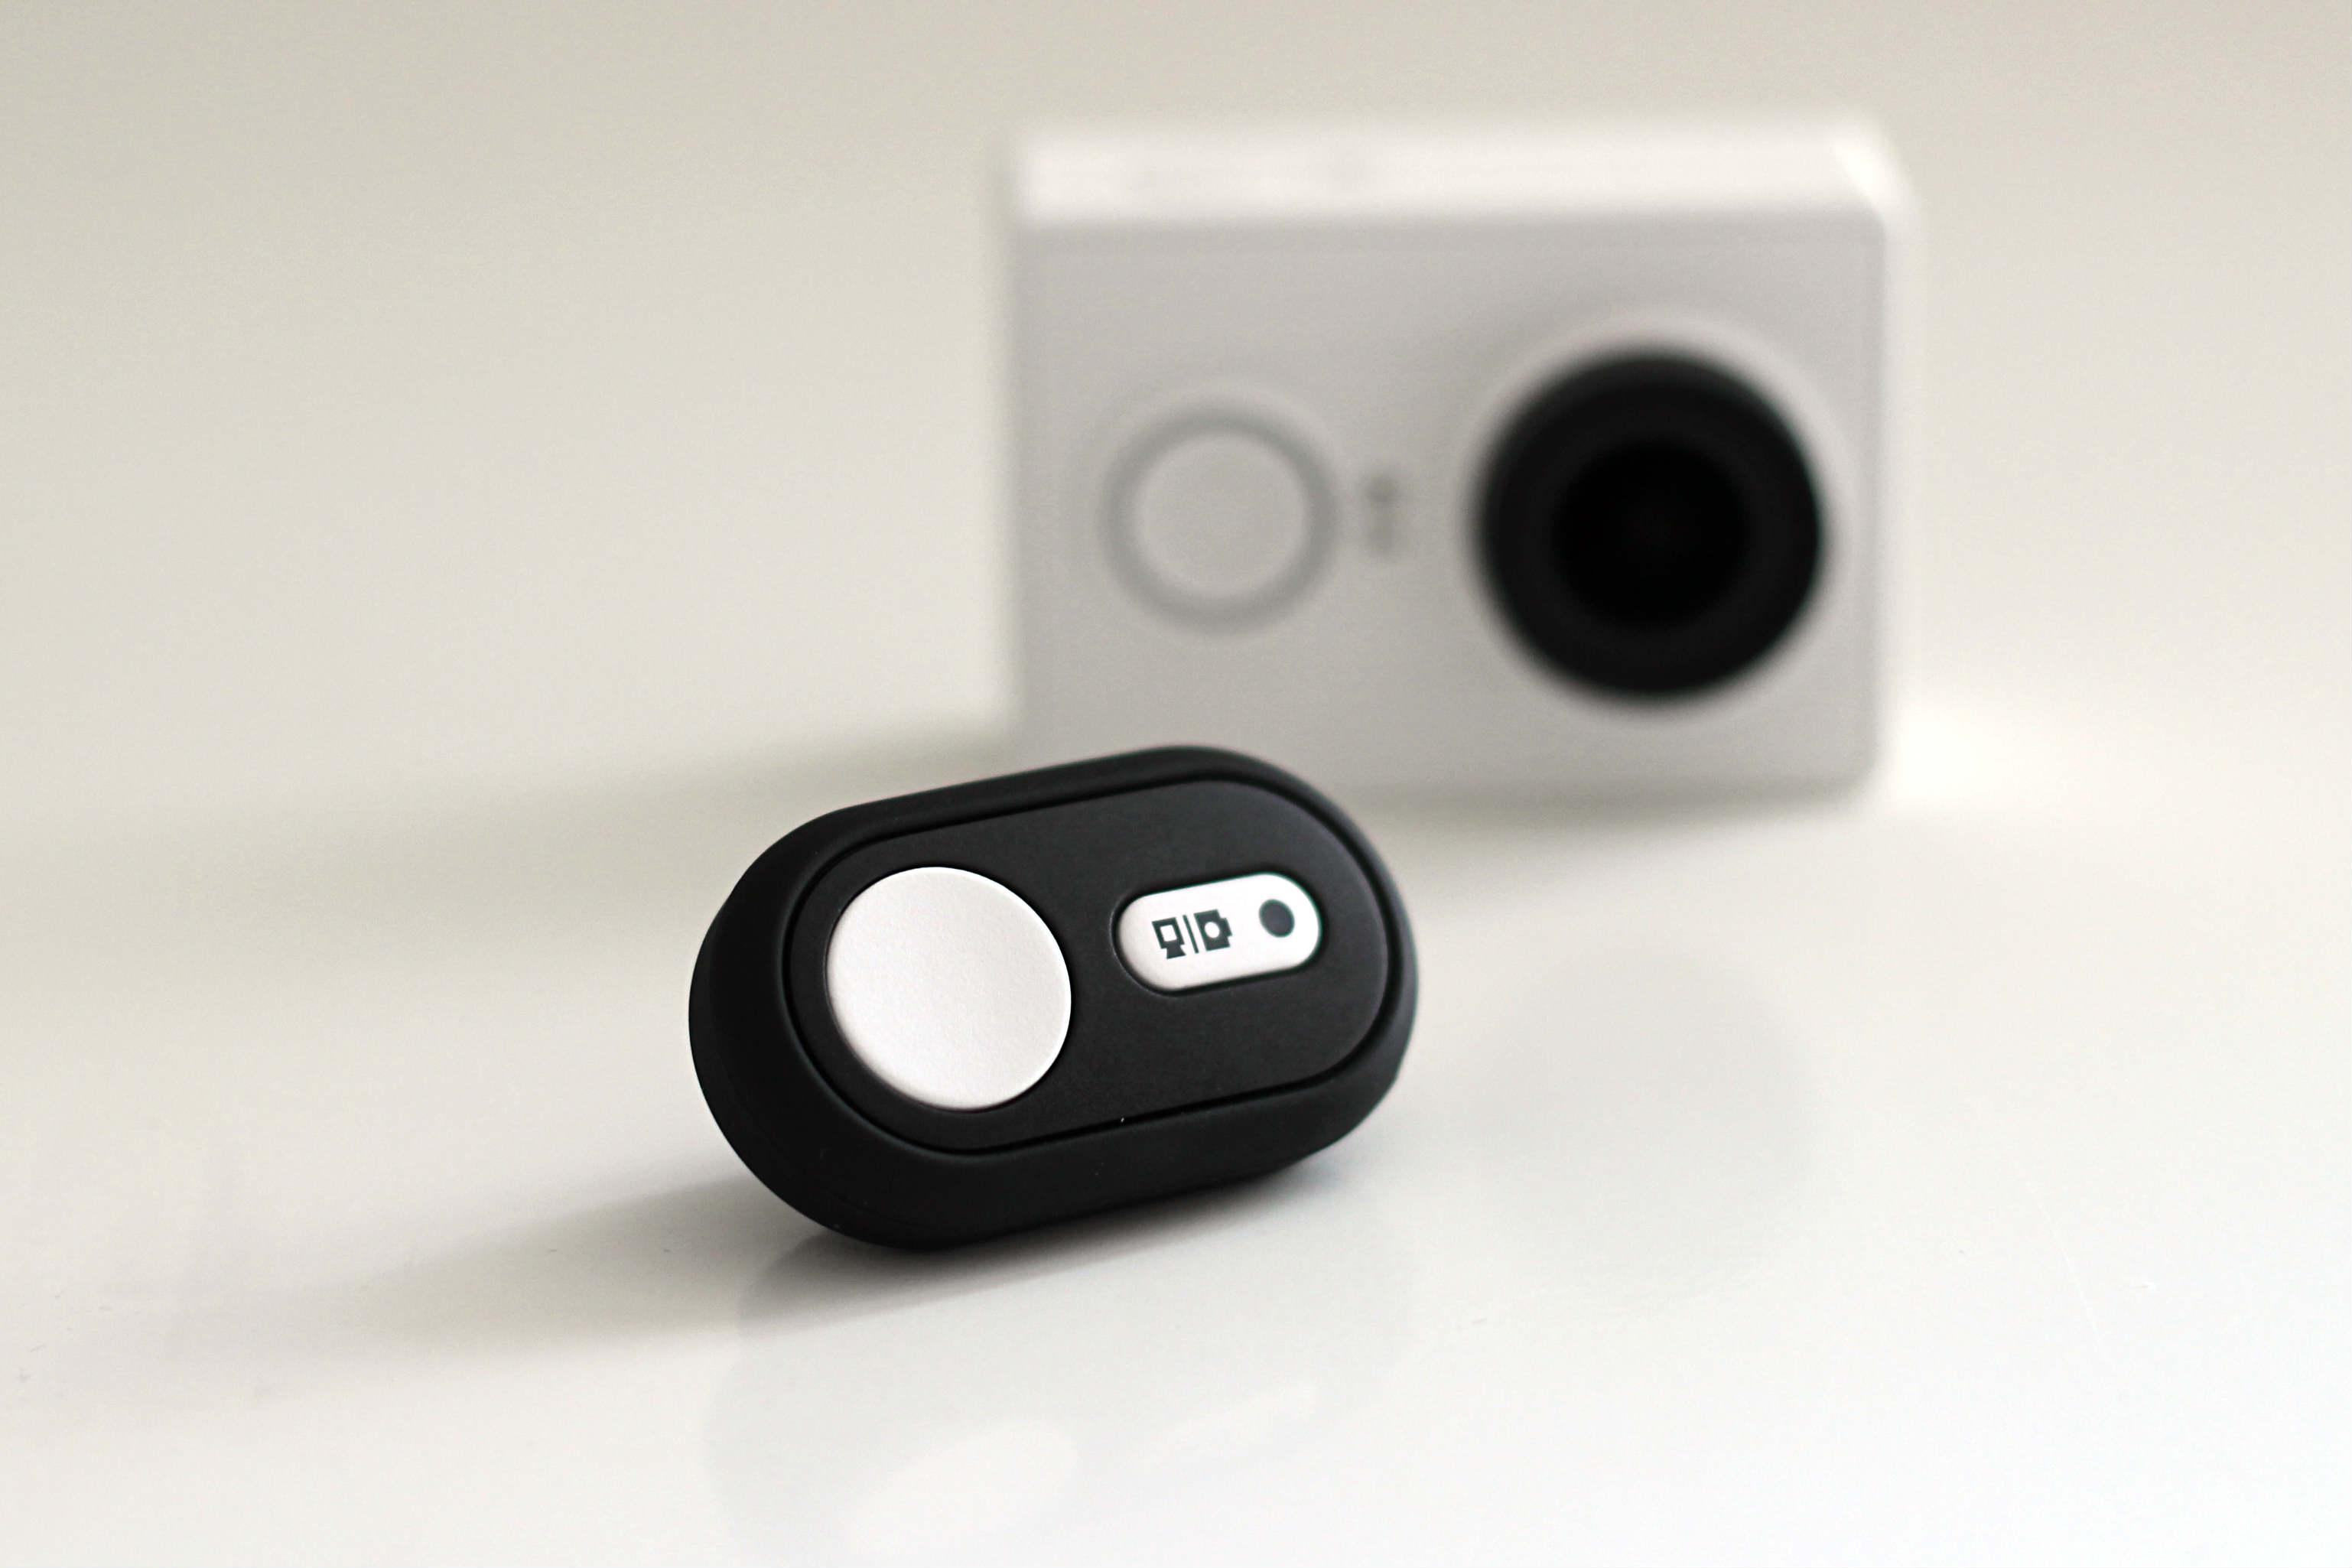 Xiaomi Yi Remote Control